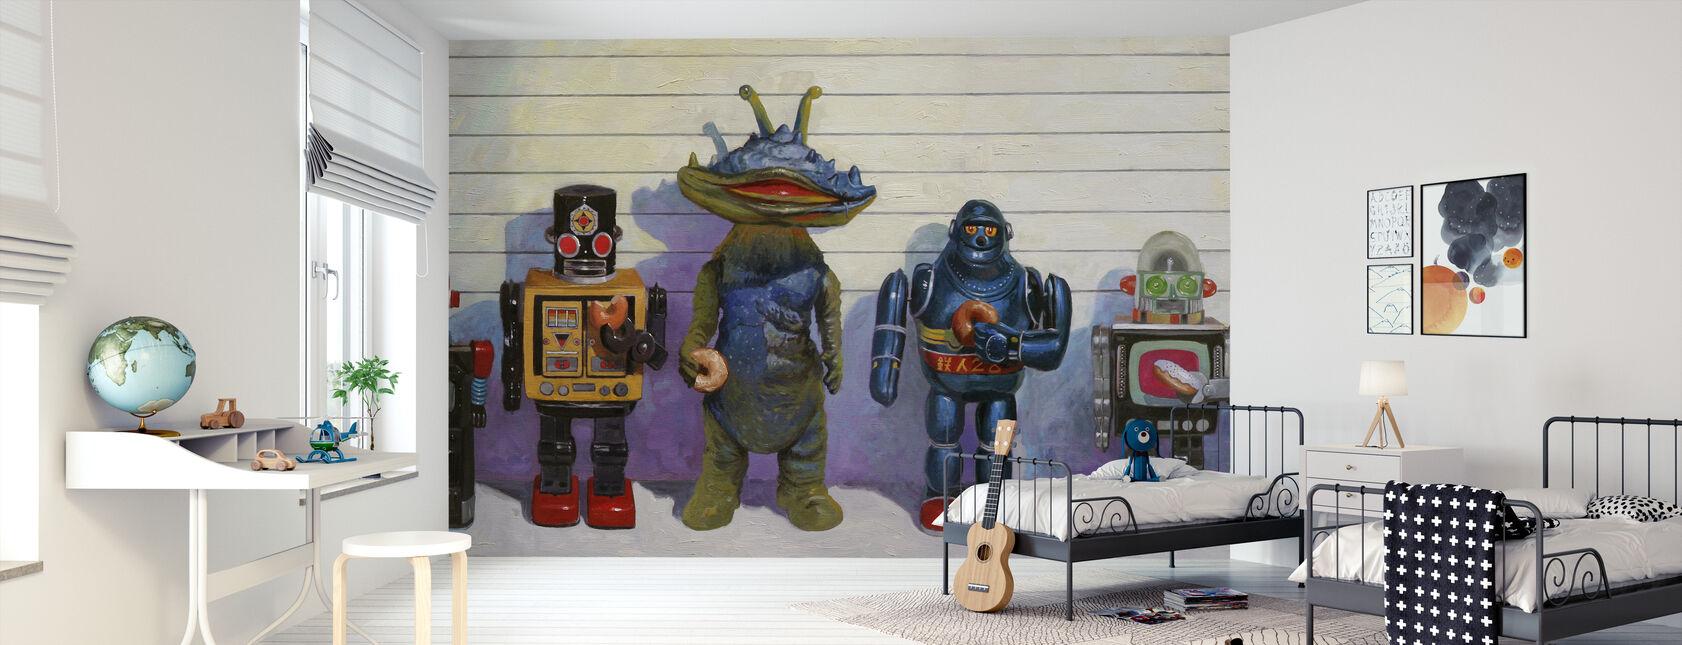 Line Up - Wallpaper - Kids Room